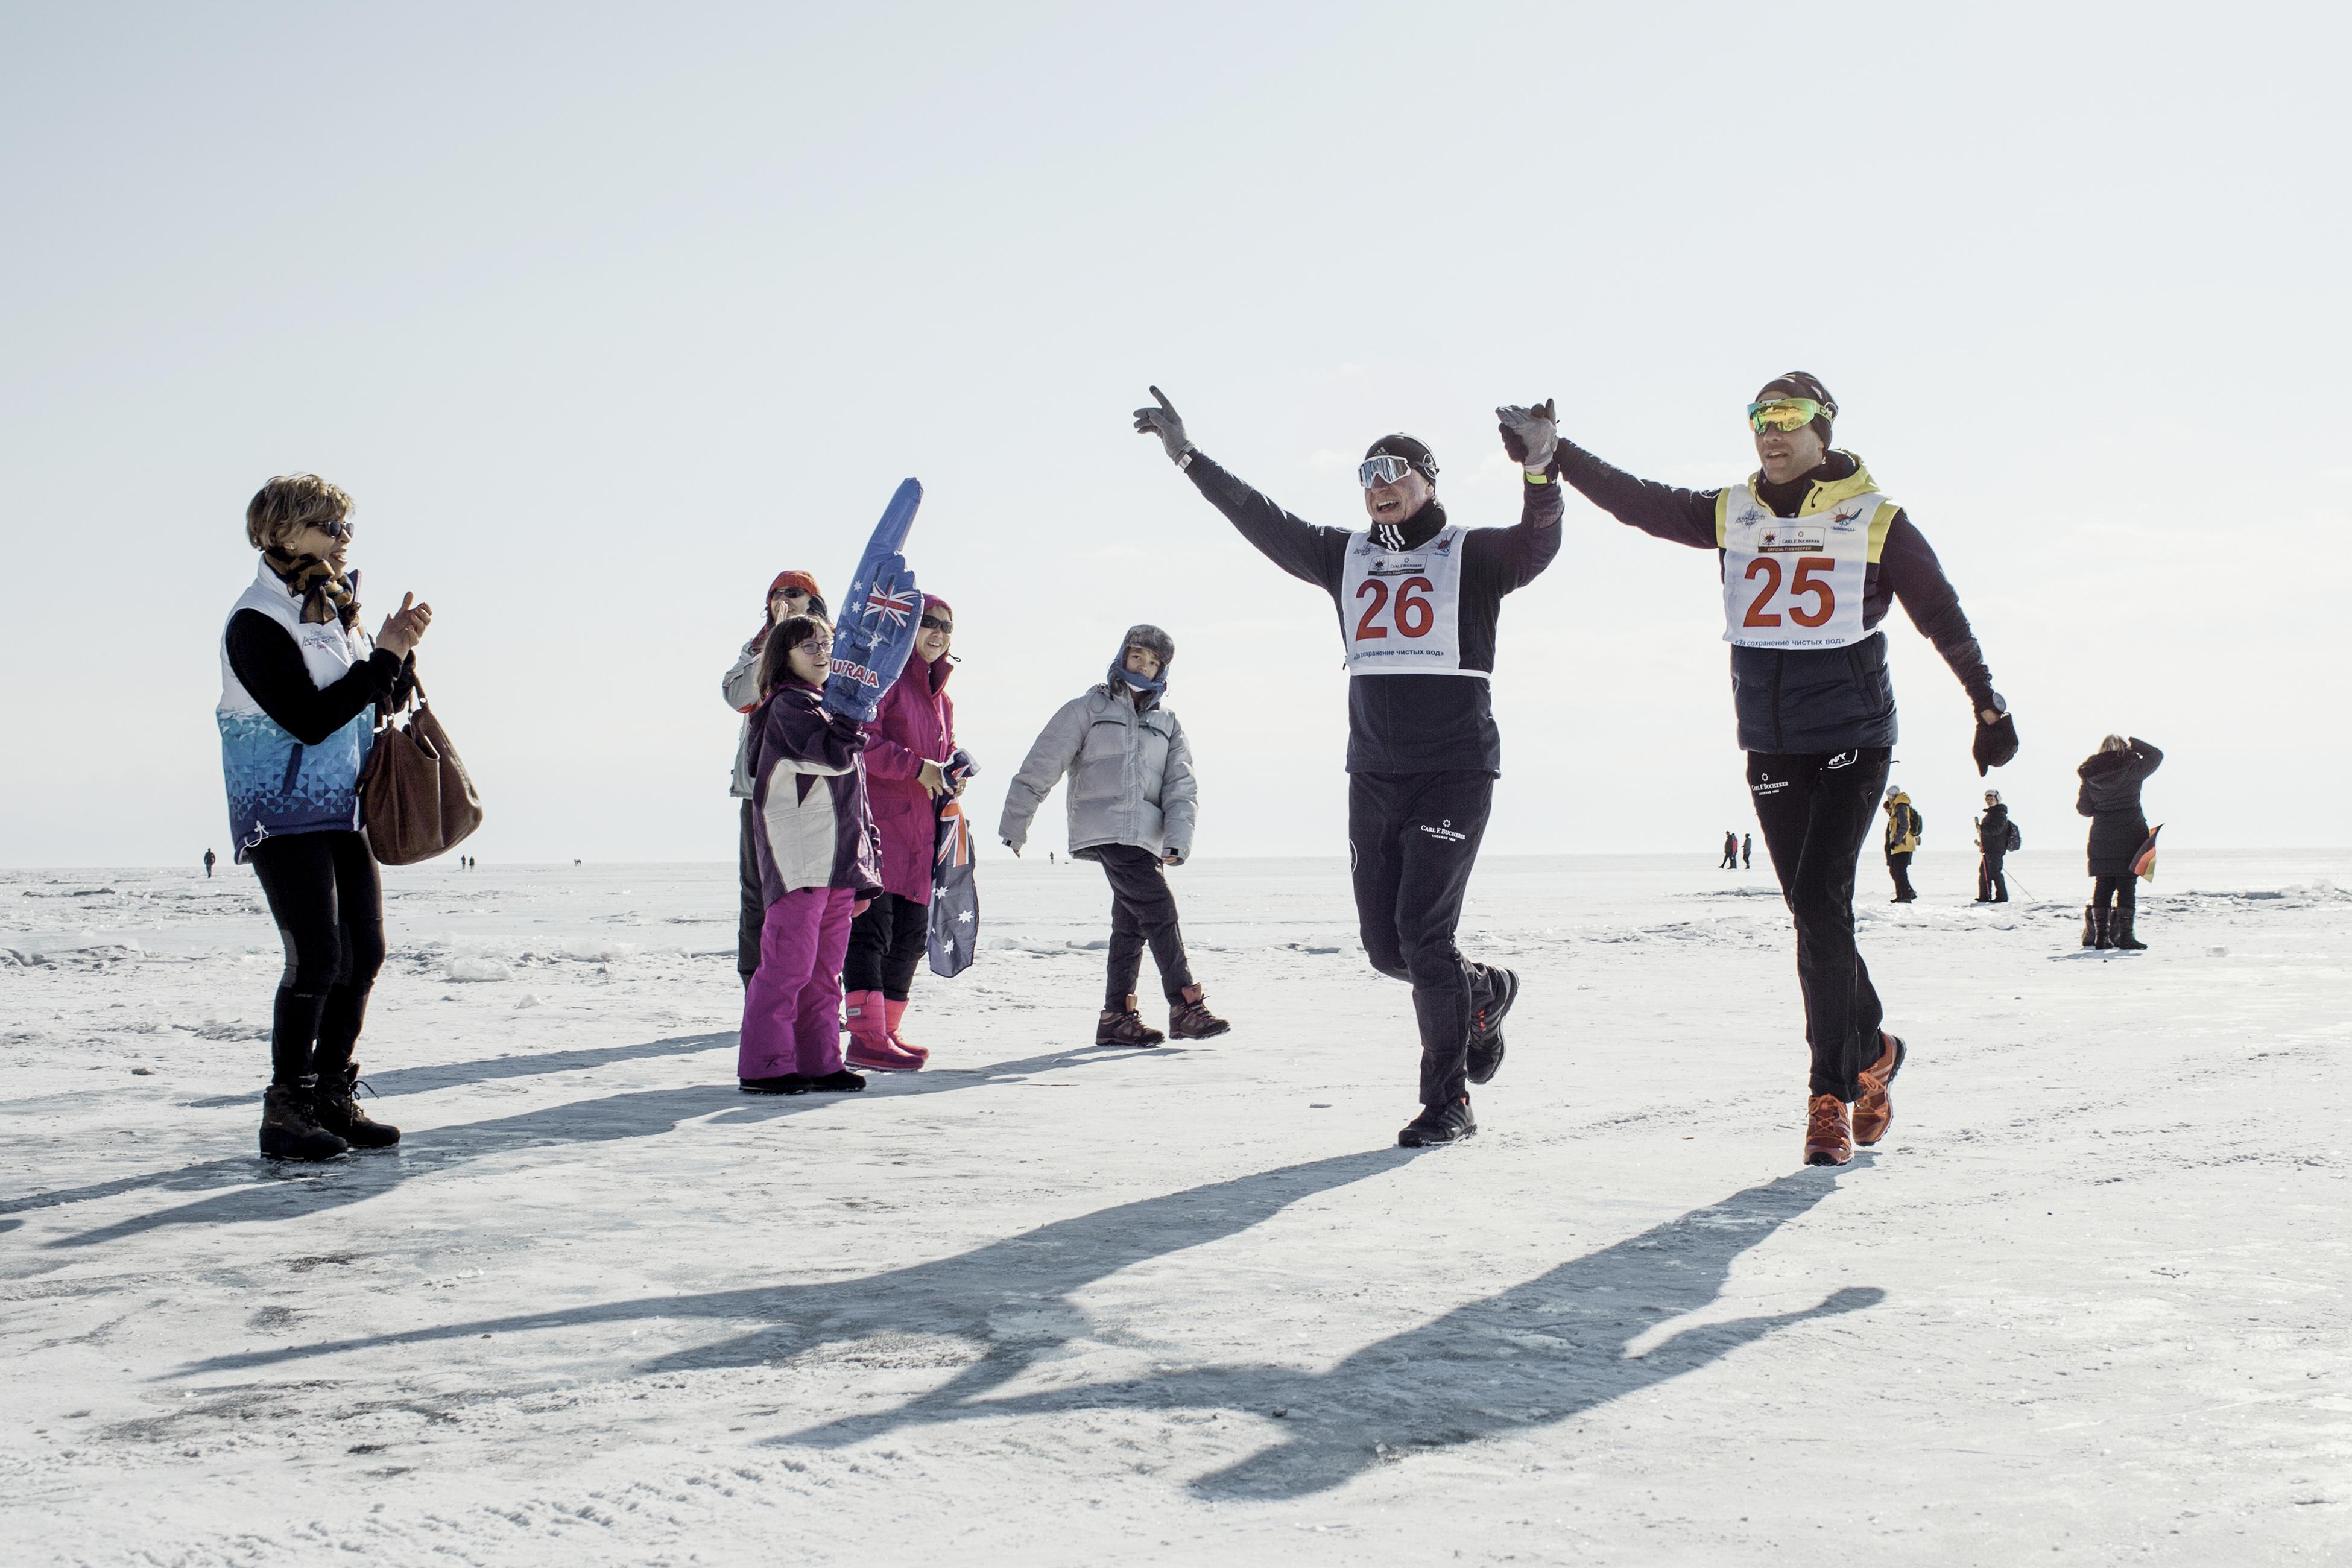 Running partners Vladimir Voloshin (left) and Laurent Lecamp at the finish line of the Baikal ice marathon.